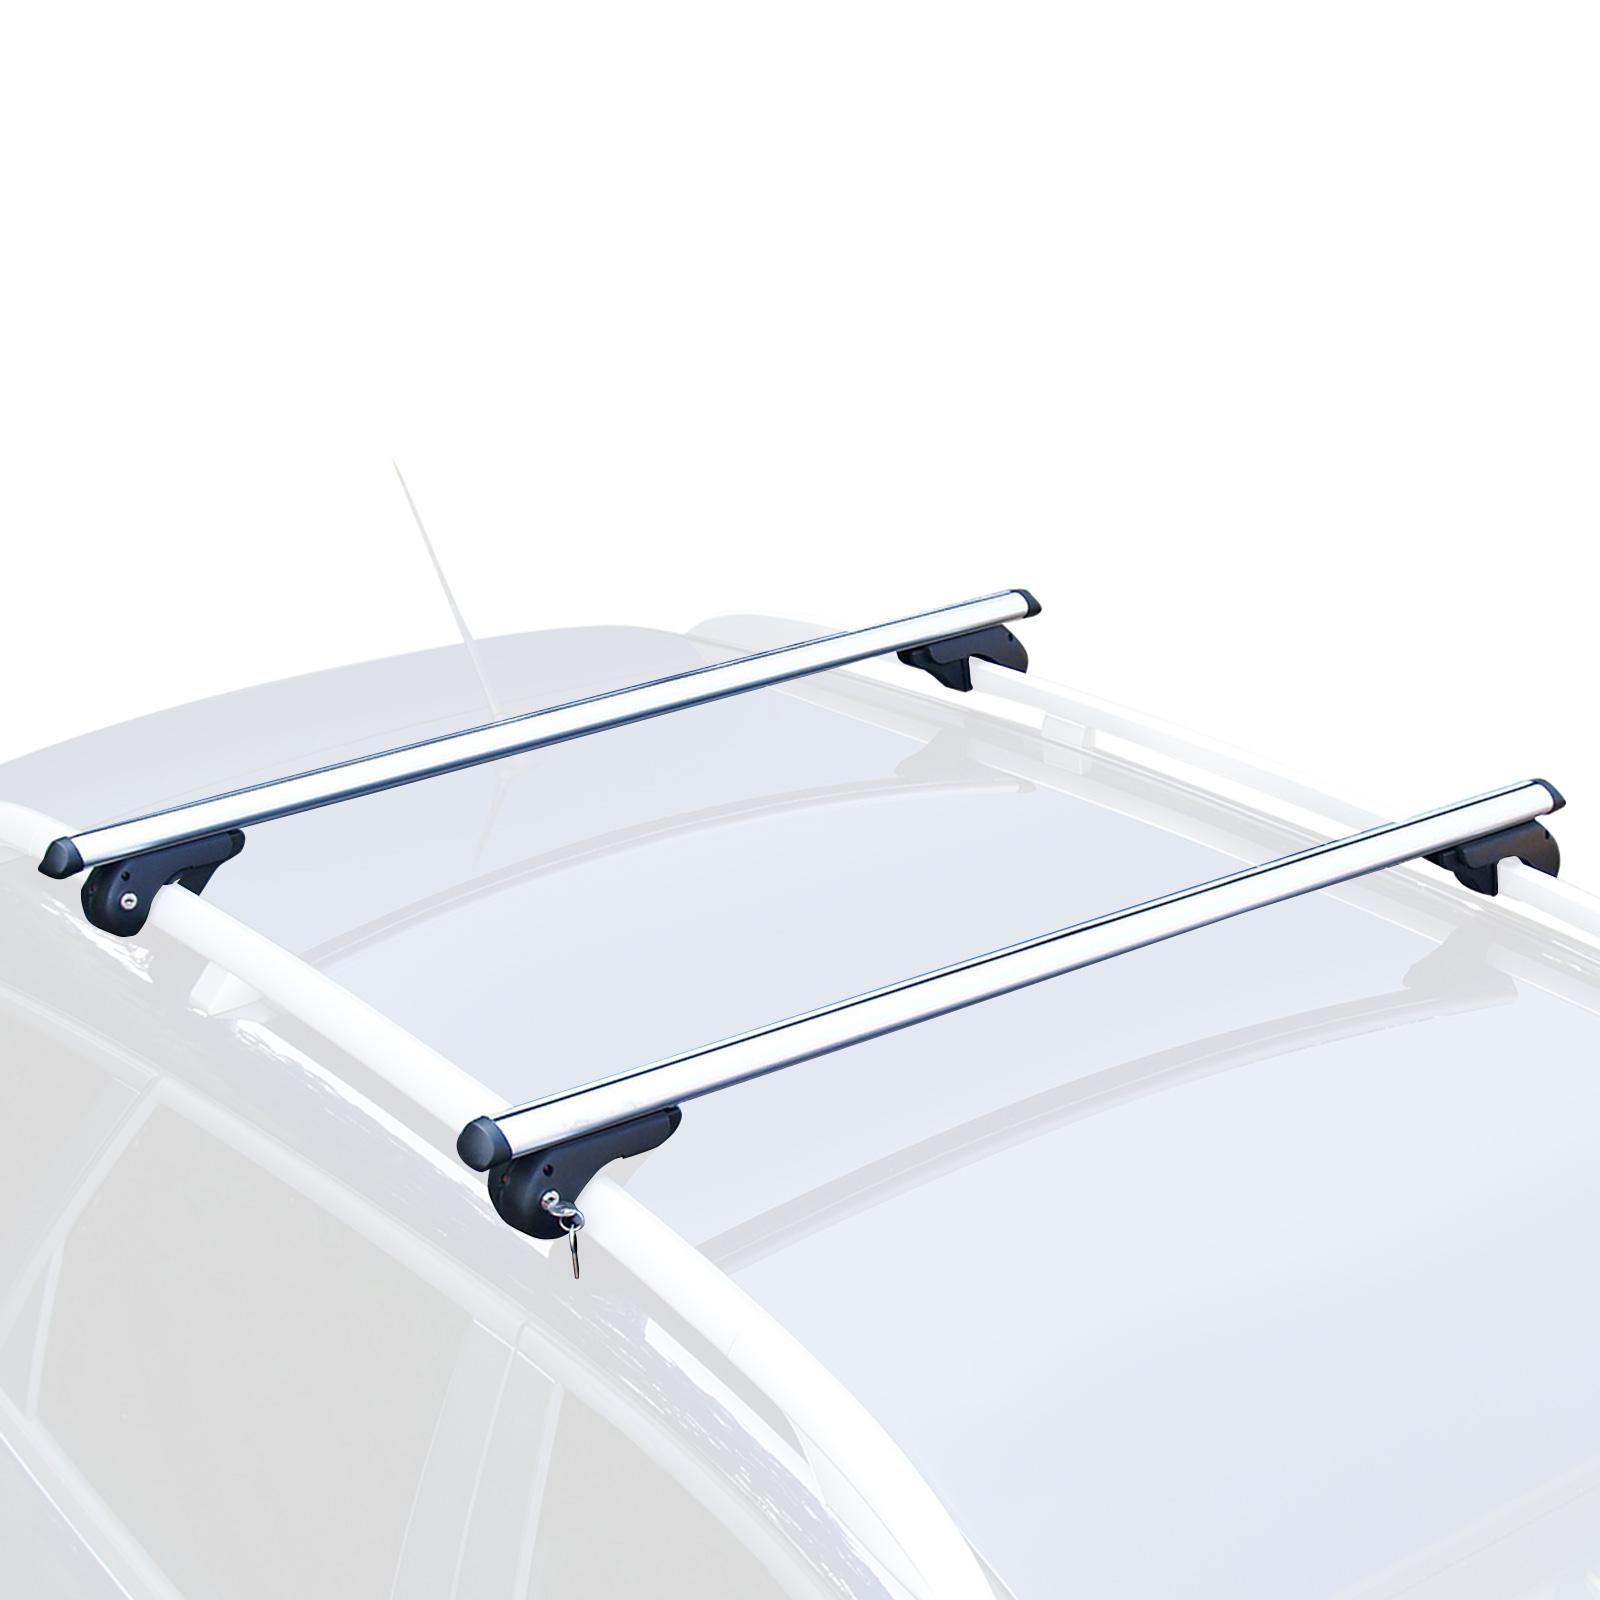 Dachträger Grundträger für Dachrehling universal 120cm Alu max. 90 kg